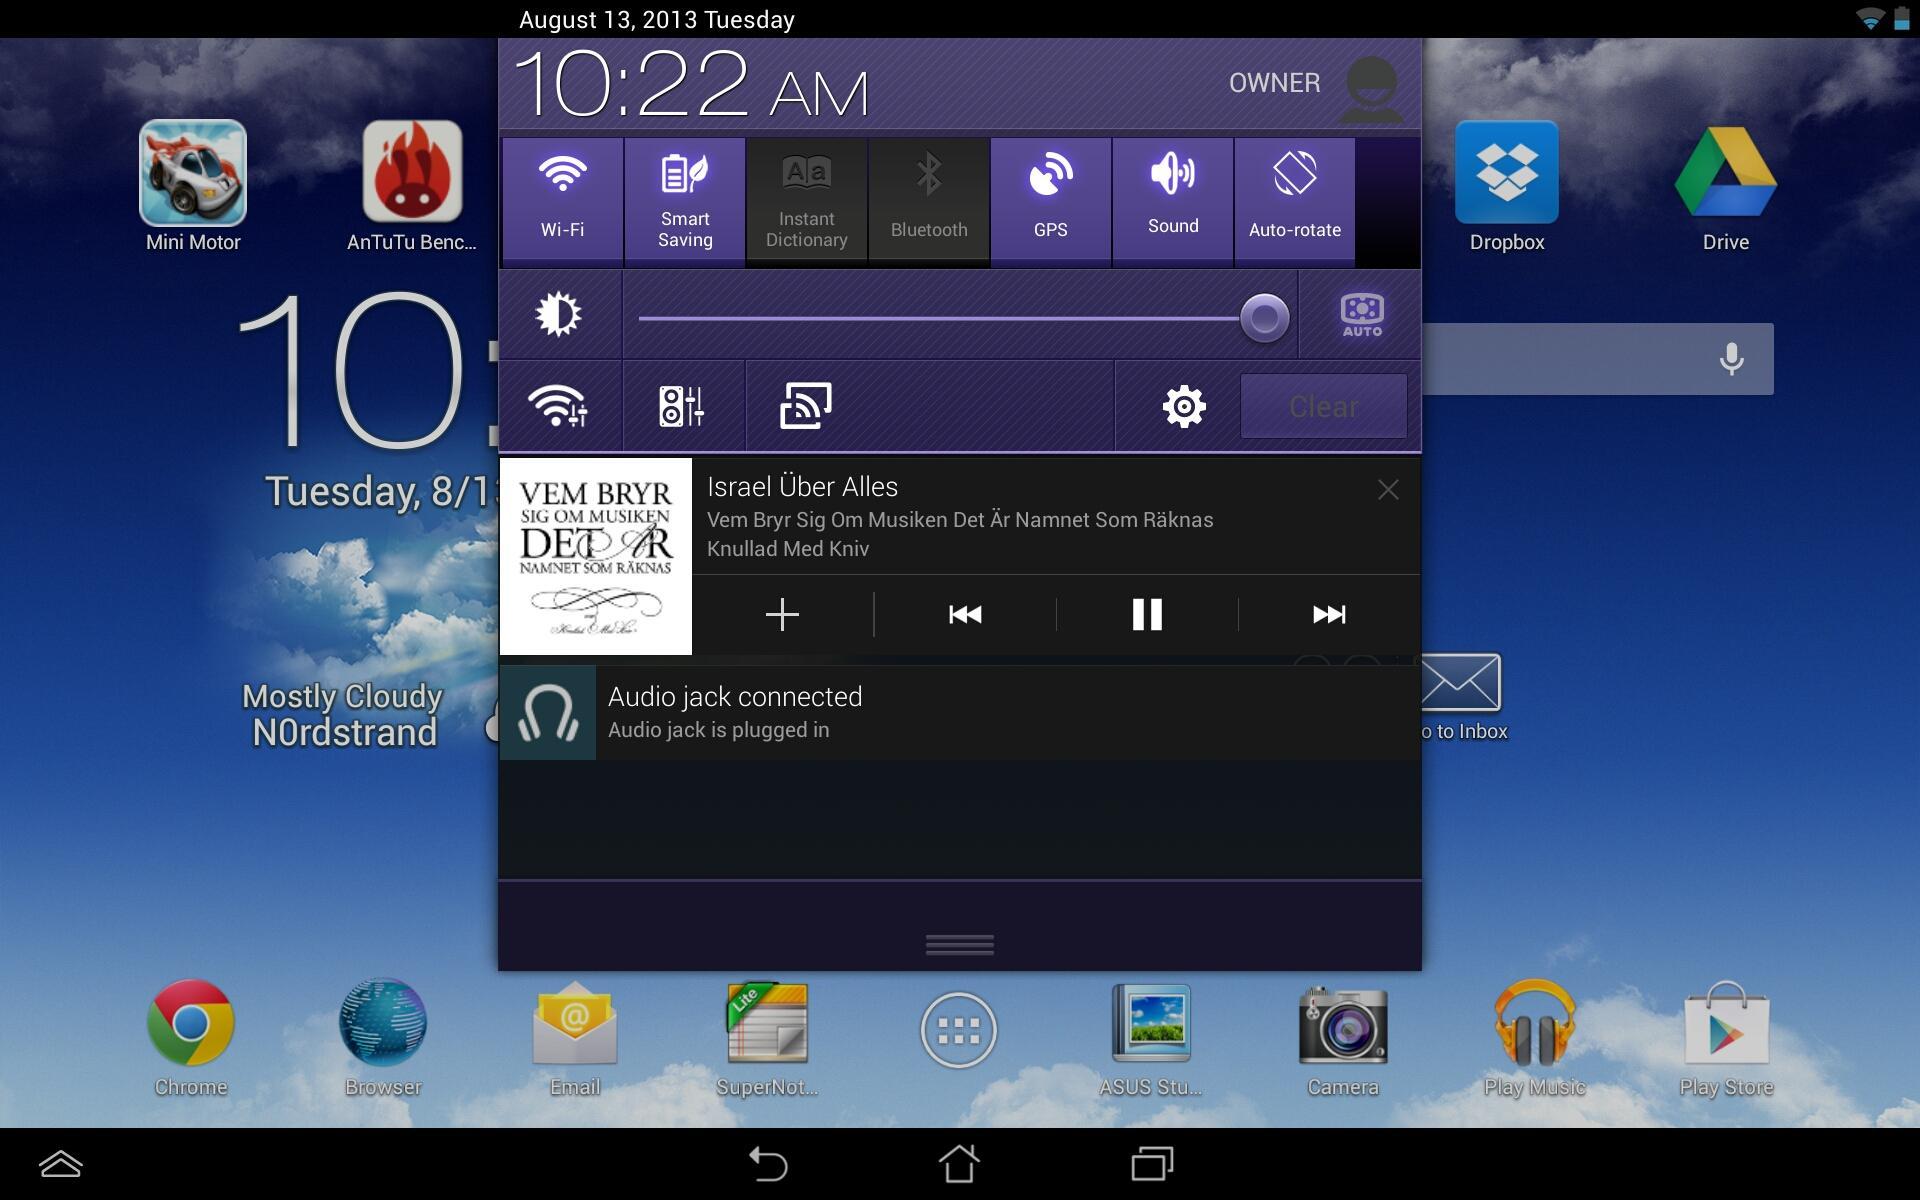 Nedtrekksmenyen i Android OS 4.2.2.